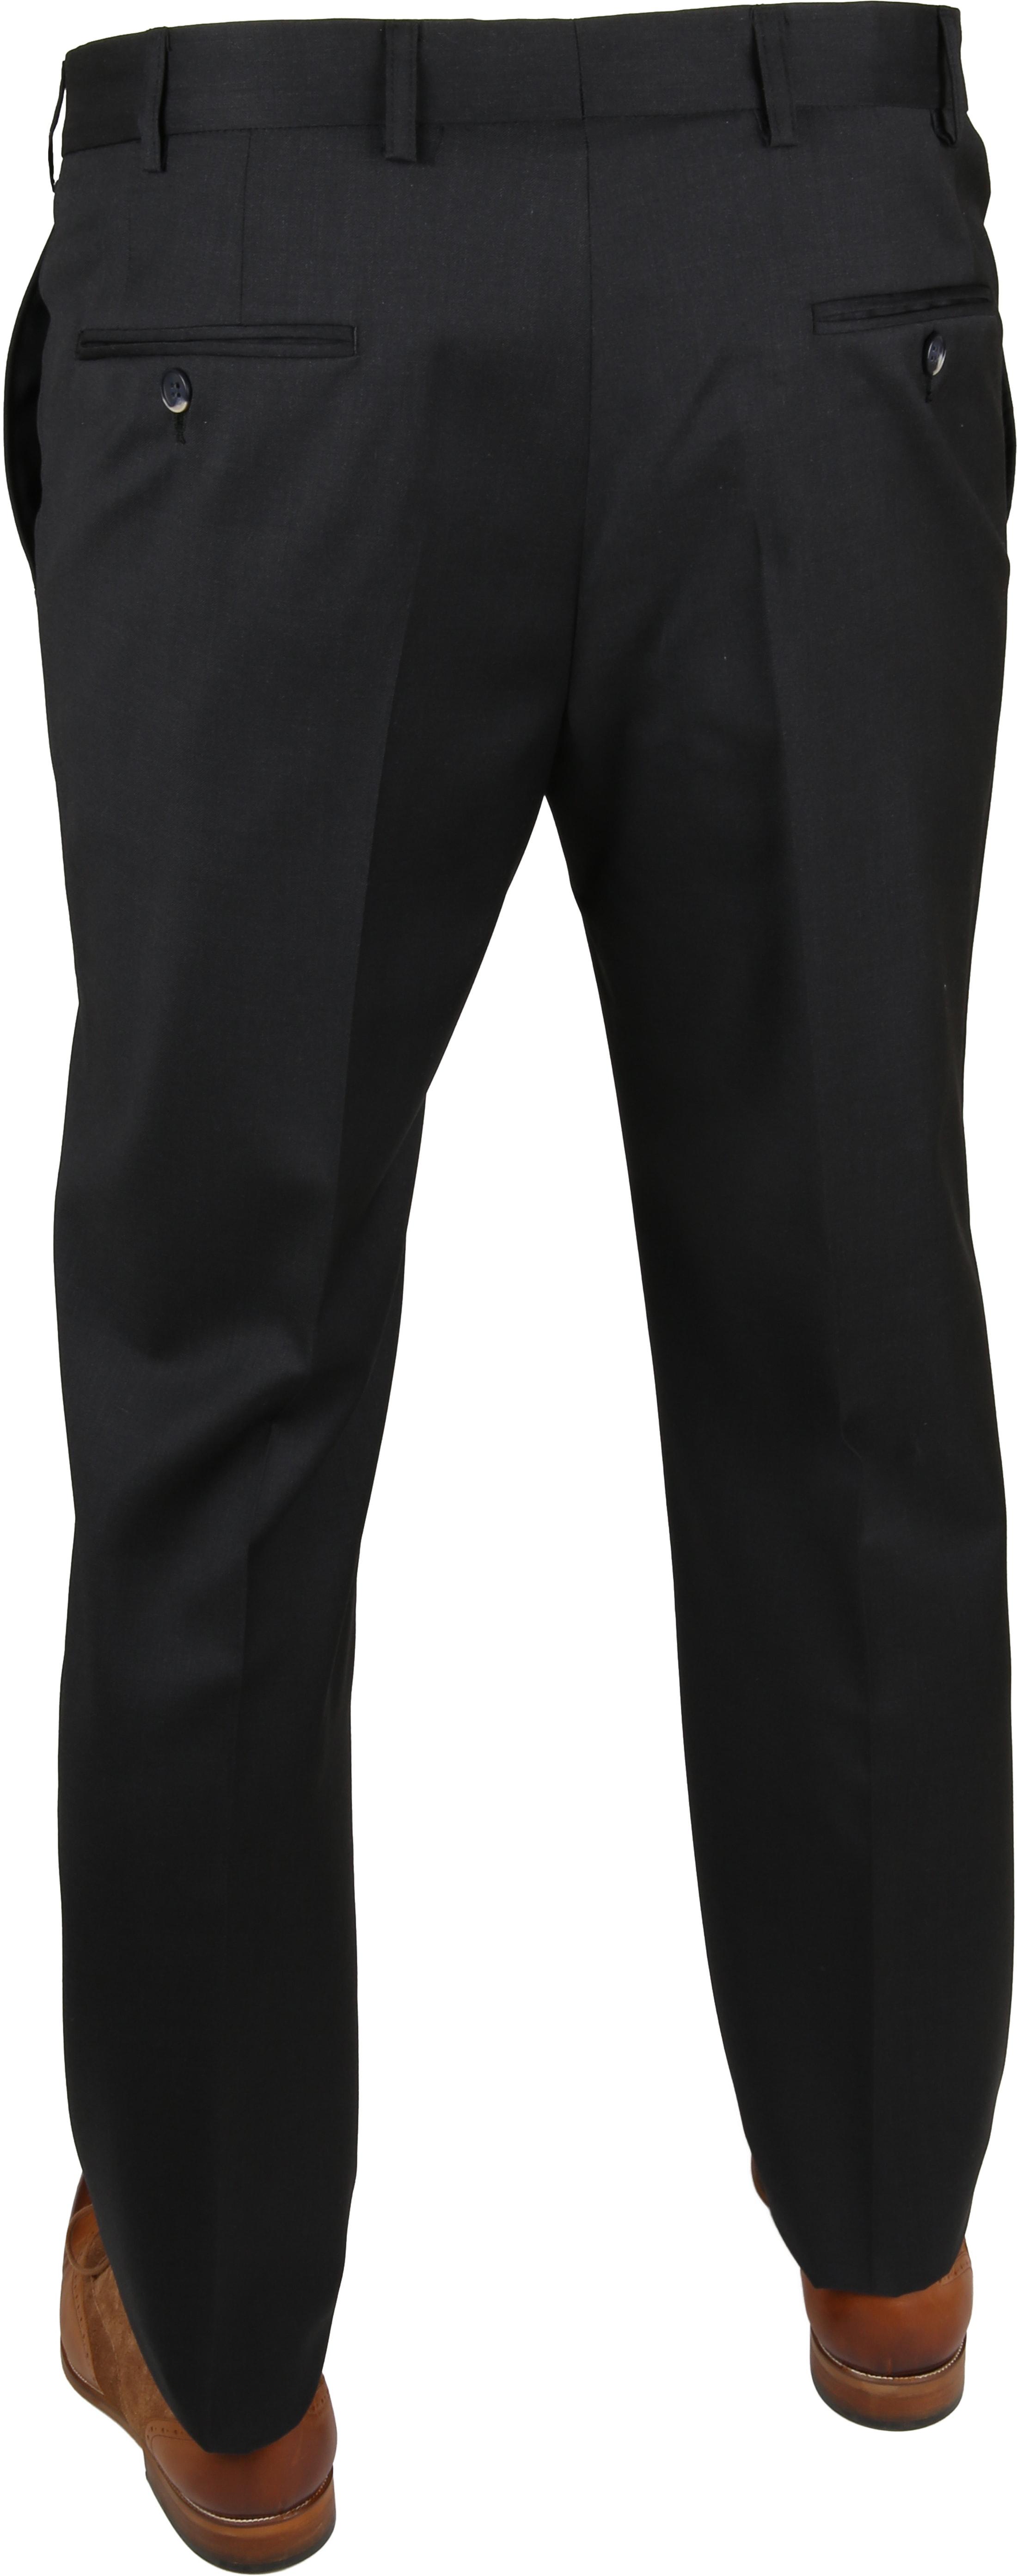 Suitable Pantalon Piga Antraciet foto 3